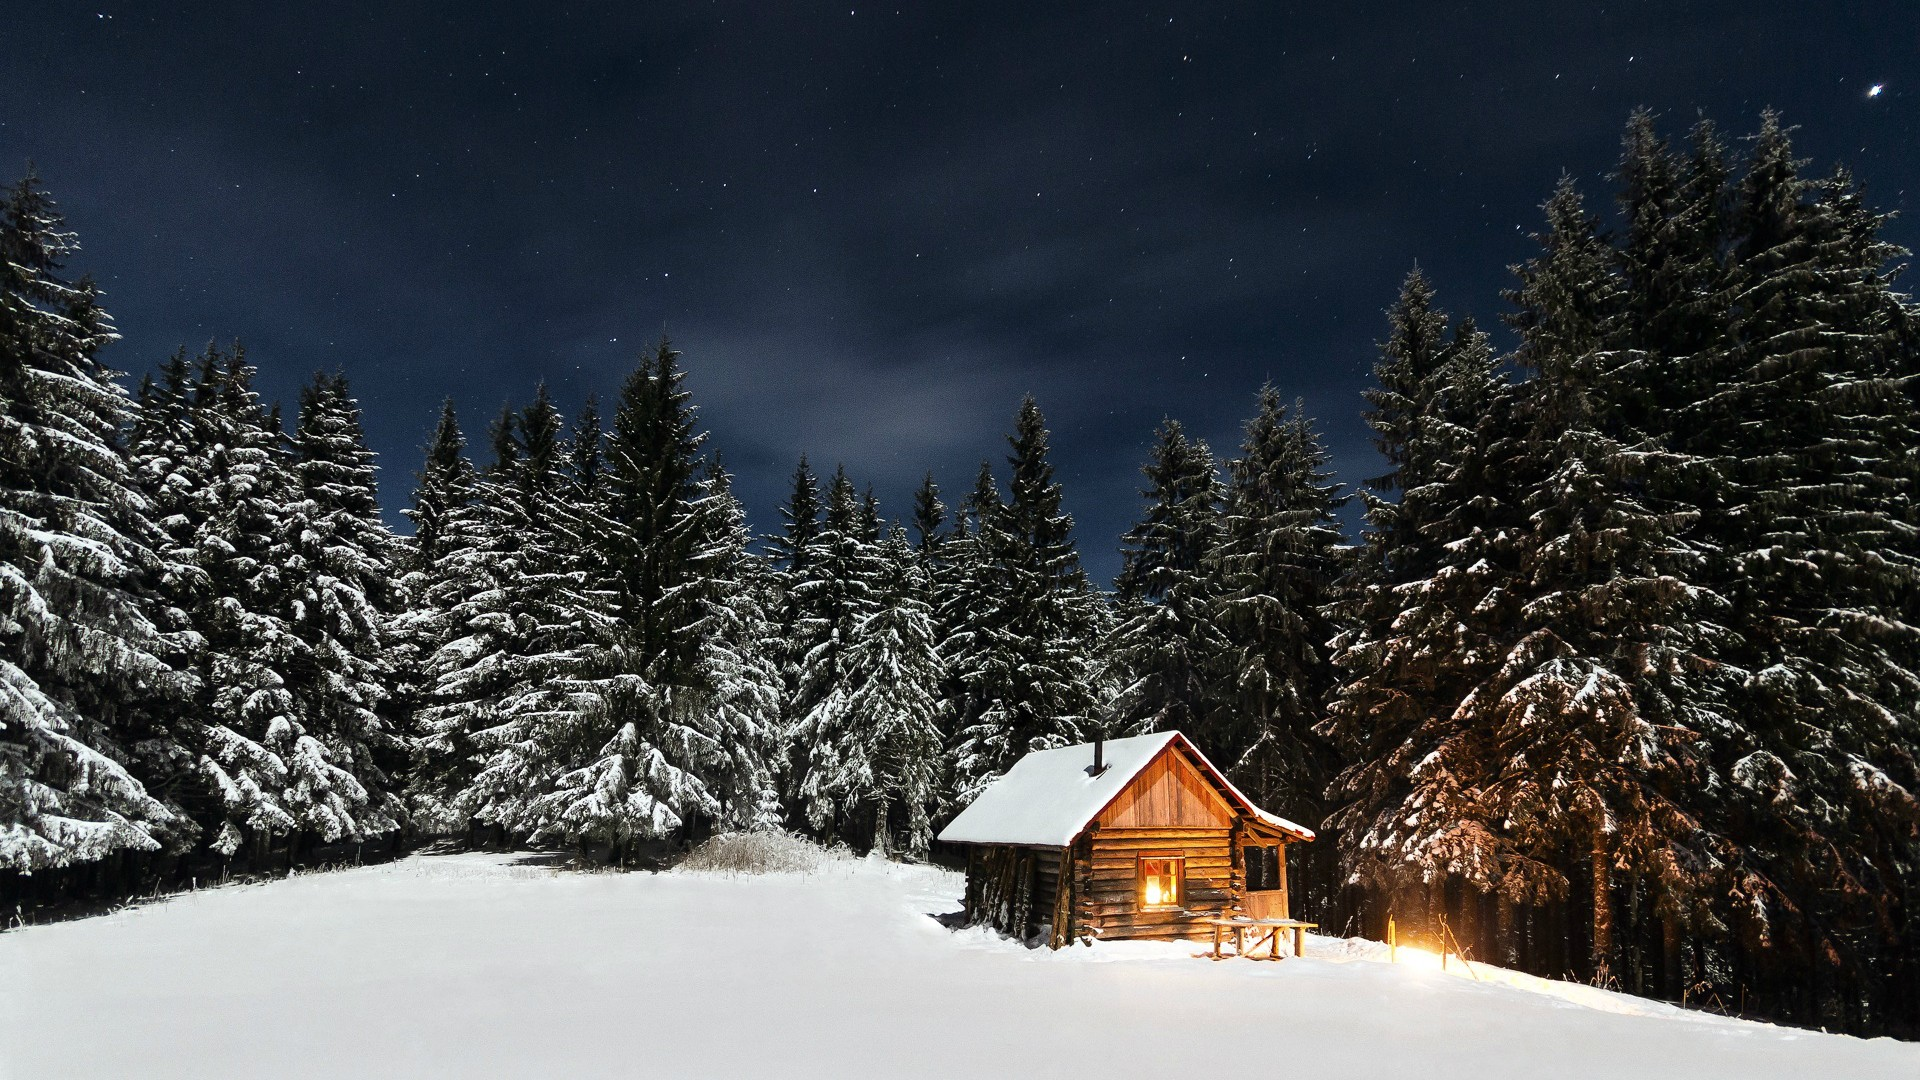 Winter Wonderland Wallpaper Download Free Stunning Wallpapers